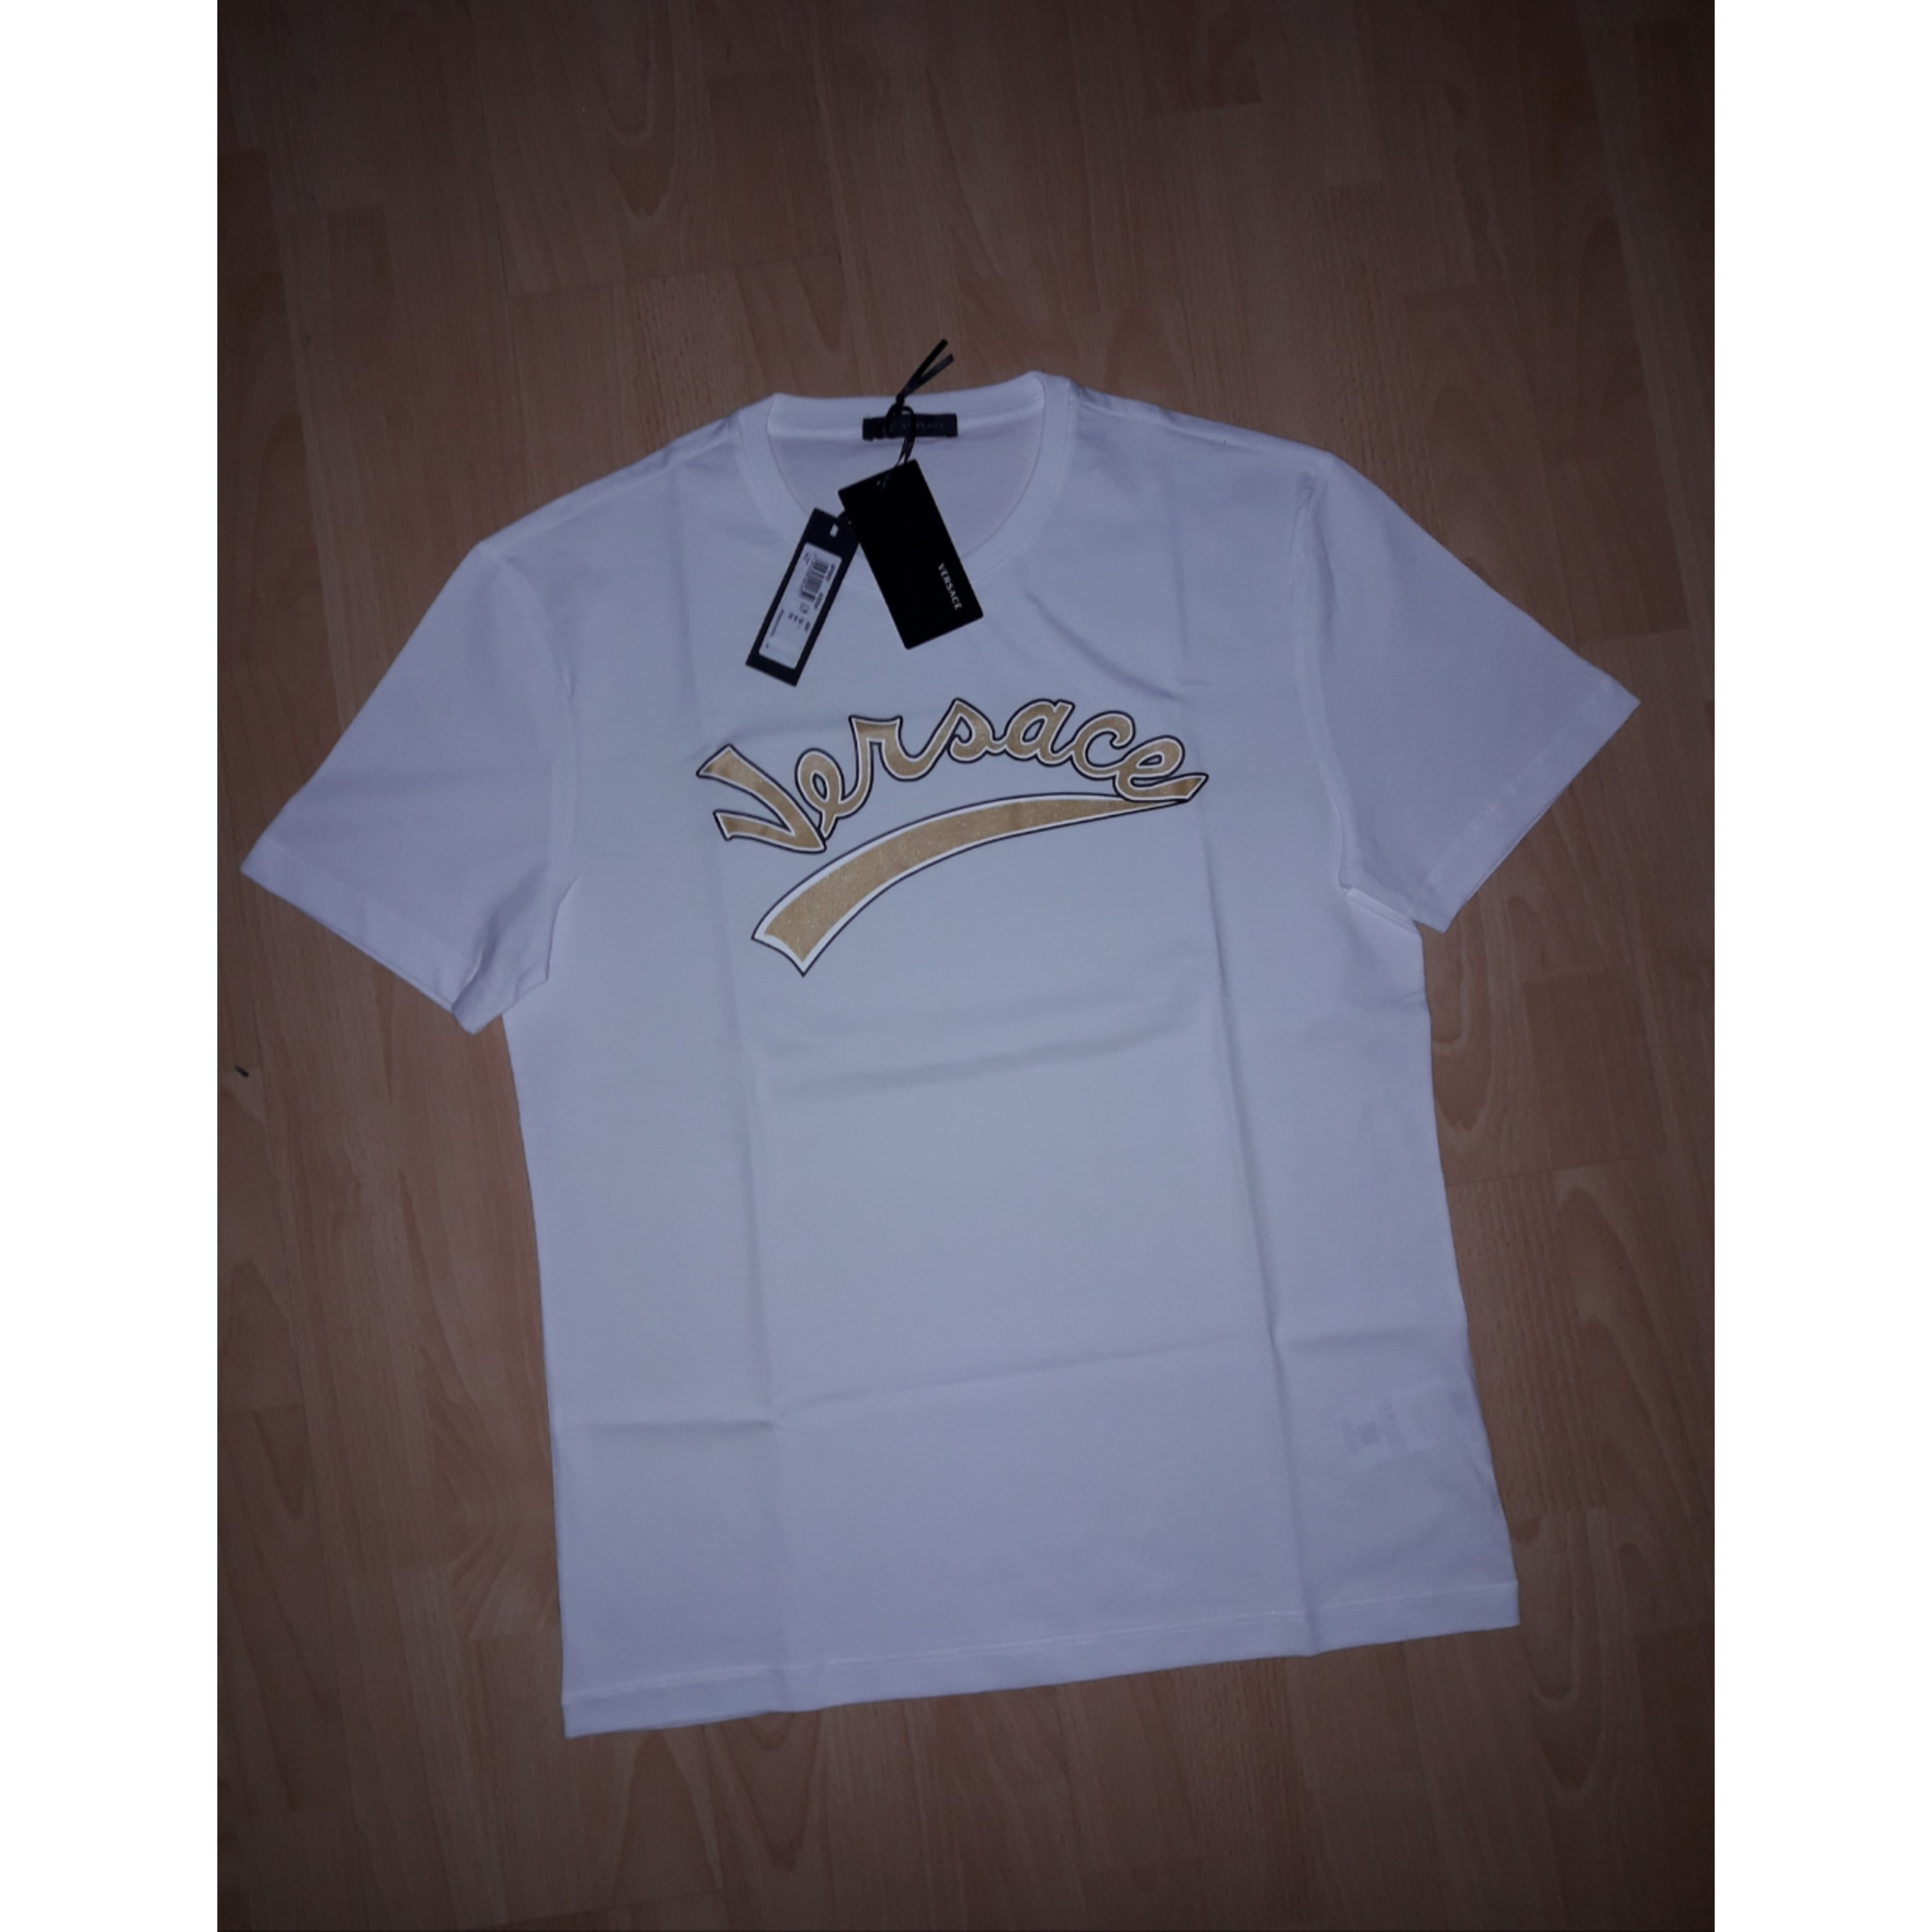 T-shirt VERSACE White, off-white, ecru